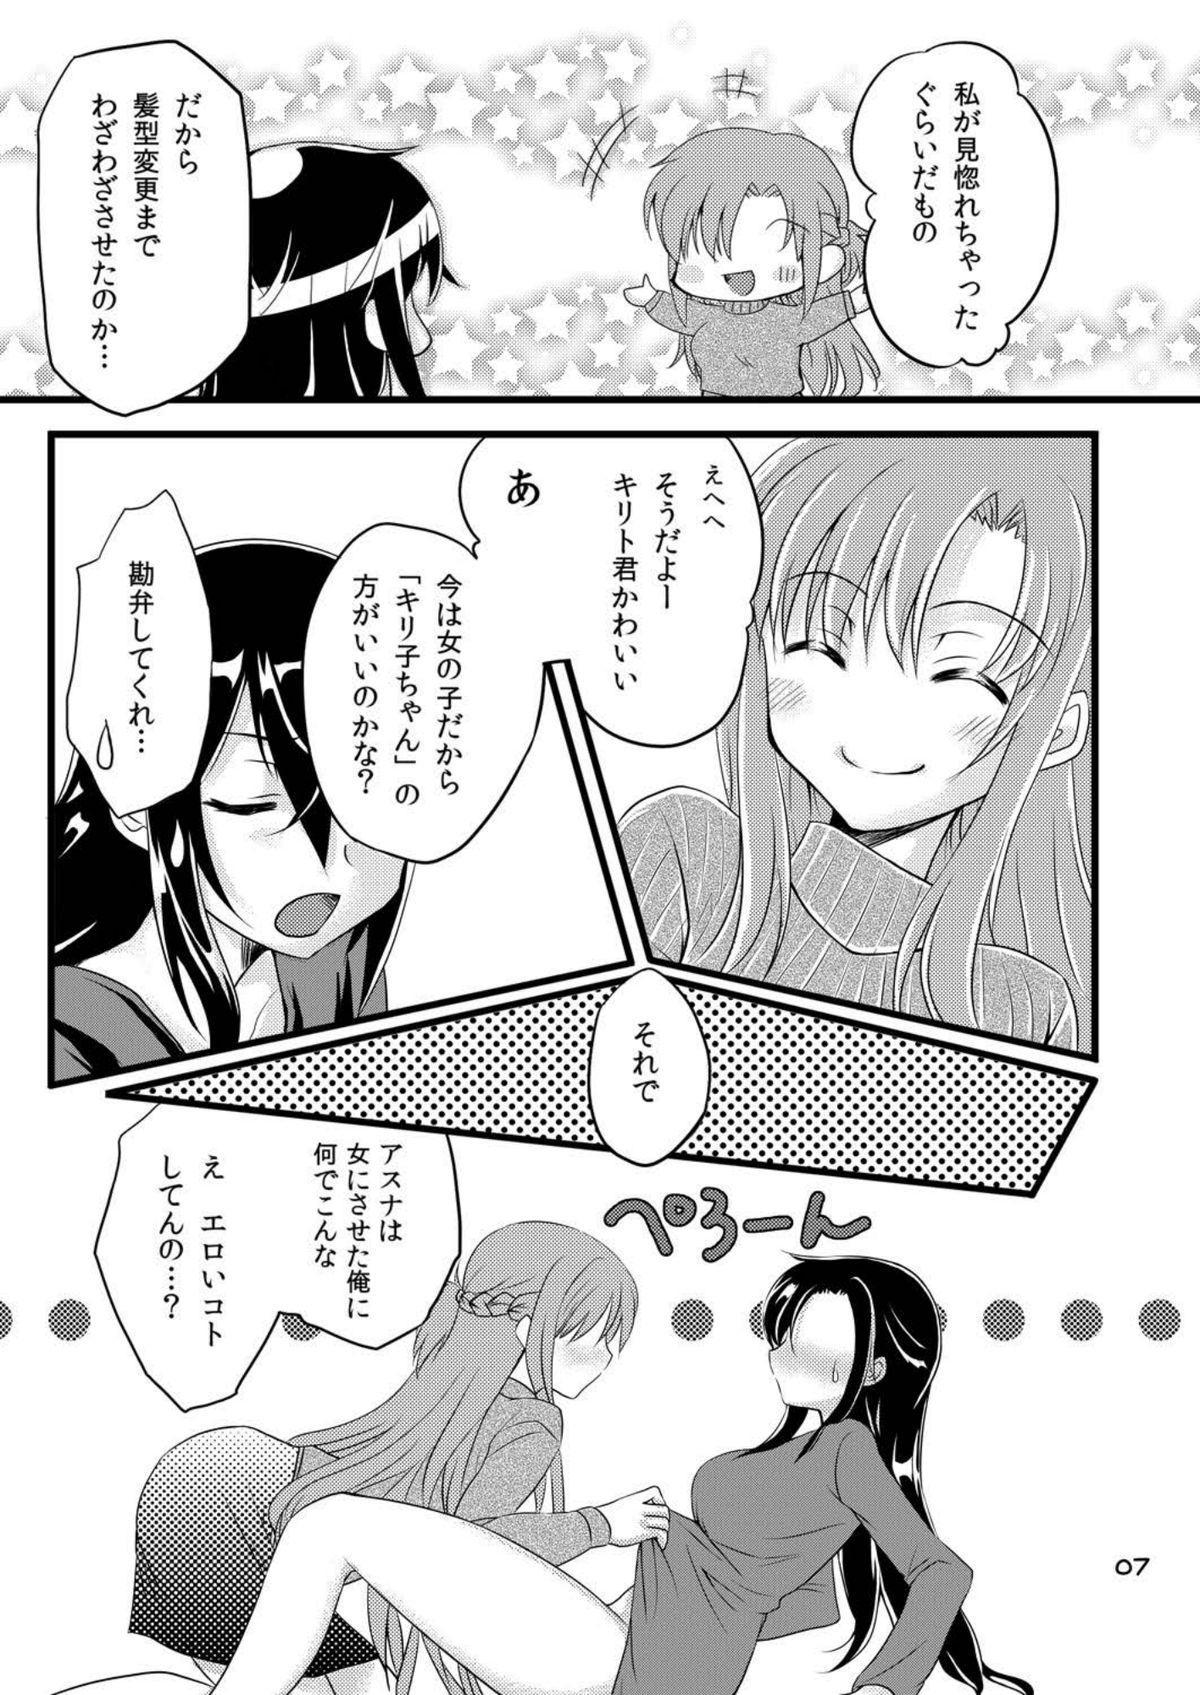 Kiriko-chan to Asobou! 6